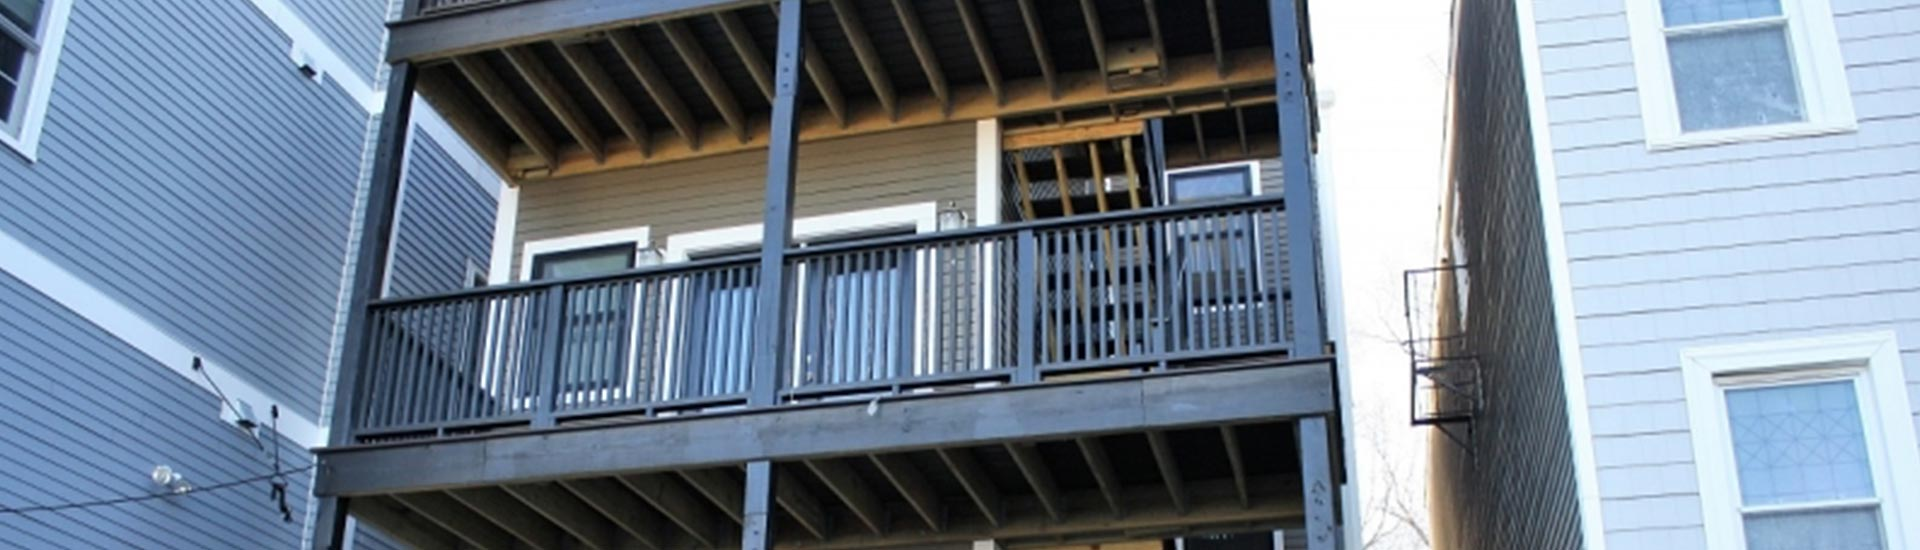 roof-deck-8